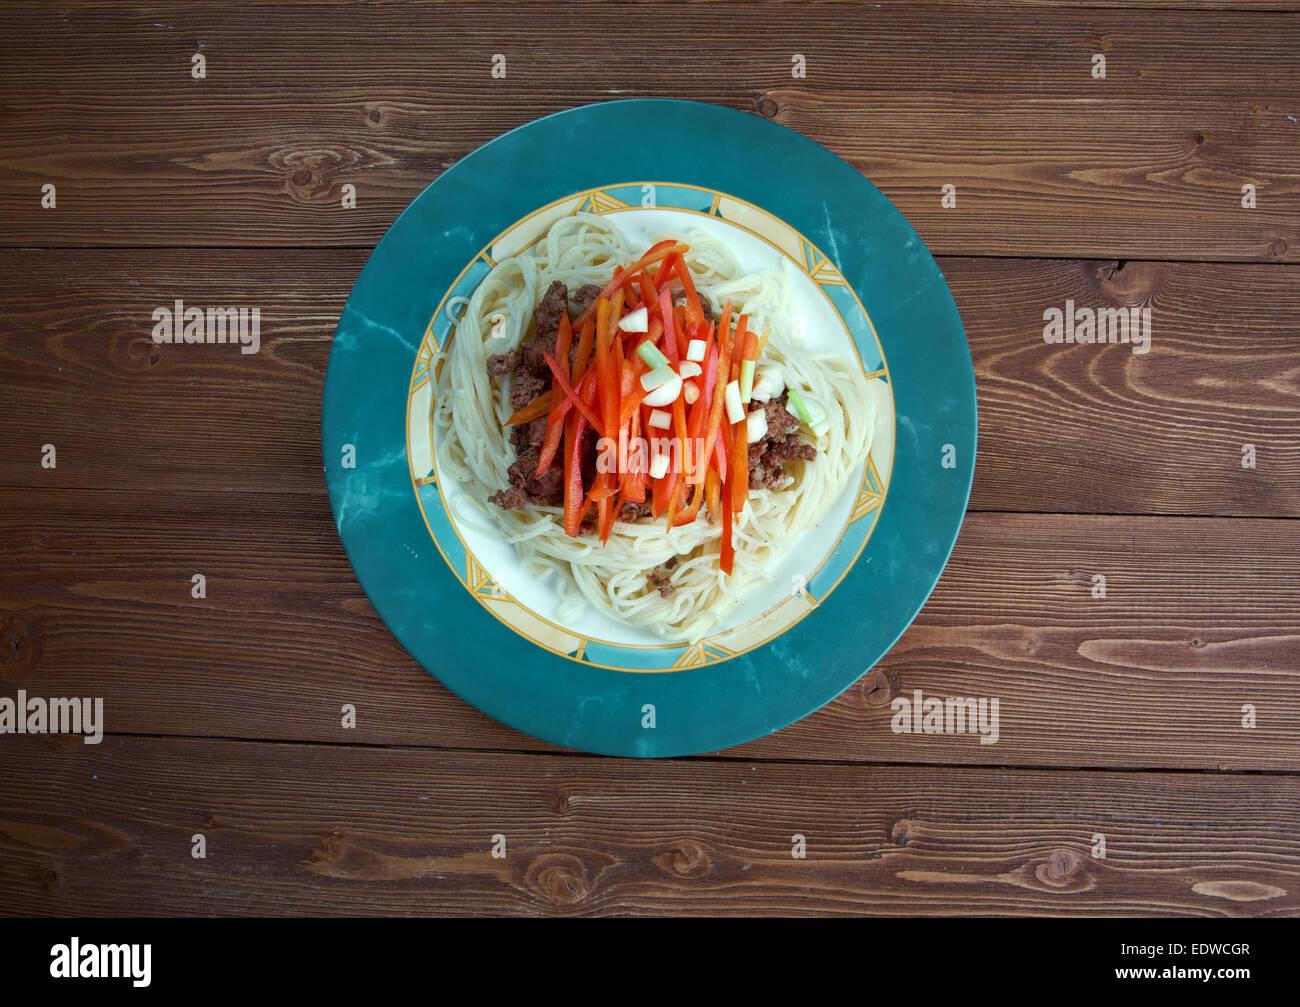 Cincinnati chili - regional style of chili con carne. ingredient chili, spaghetti, paprika , diced onions Stock Photo